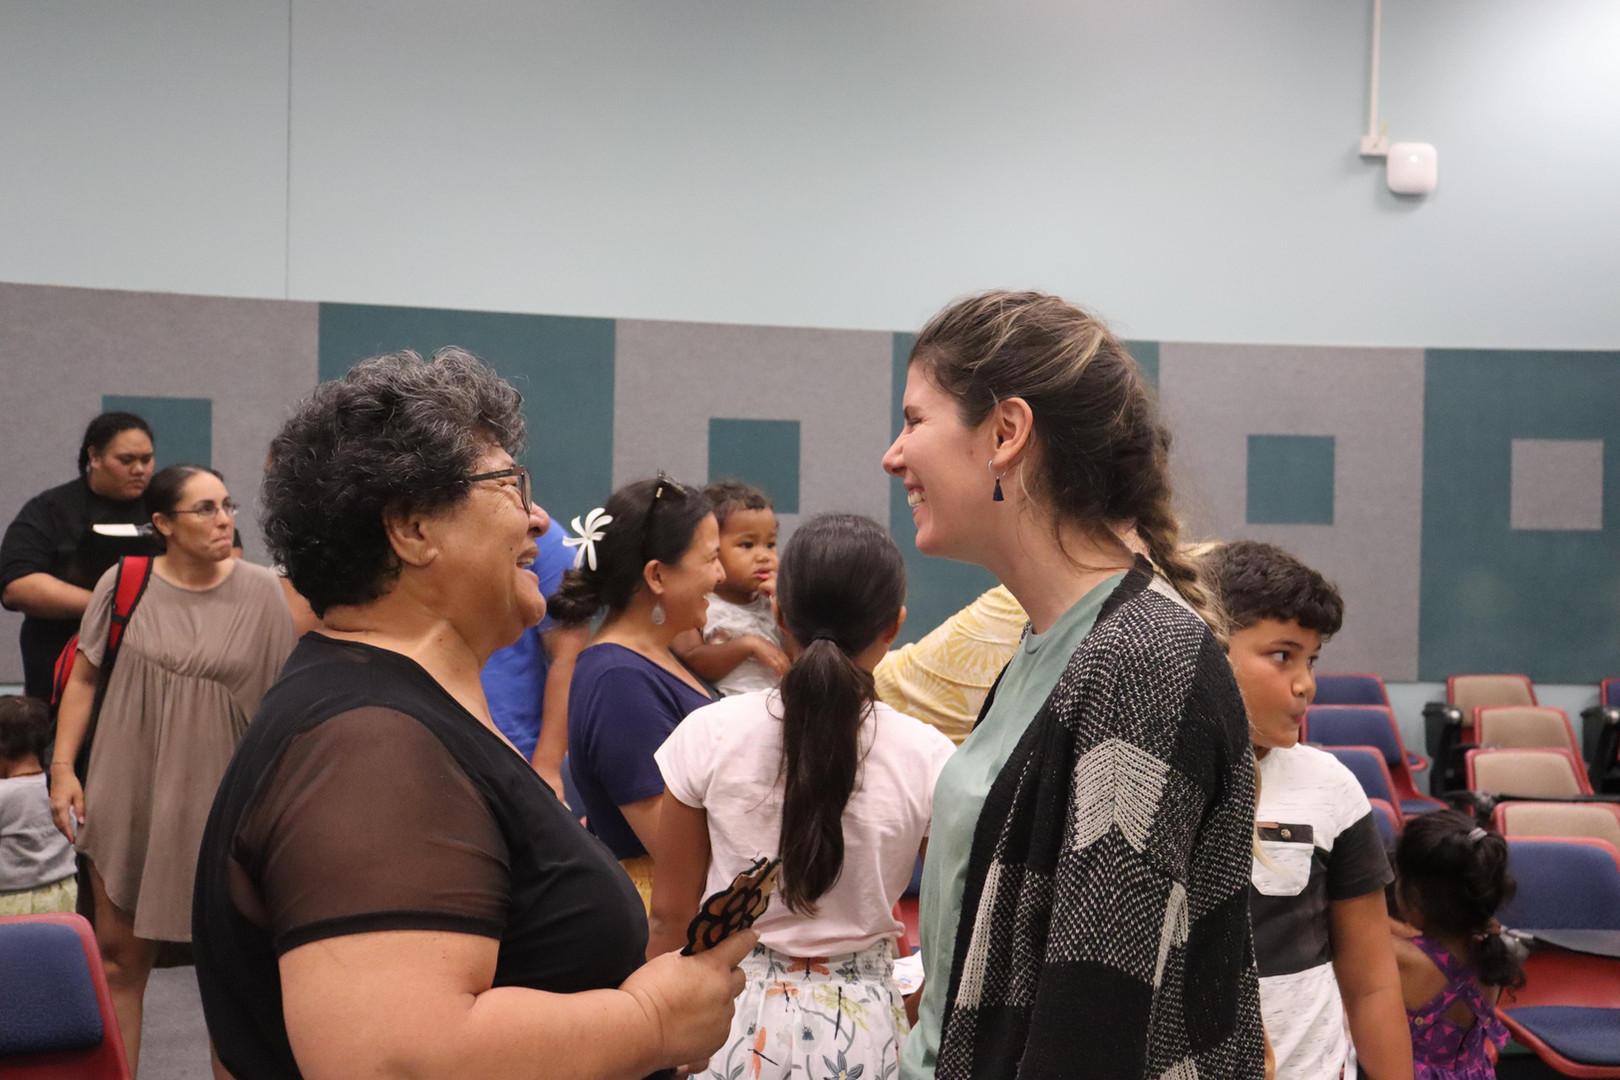 Students of the Qld Tongan Language School